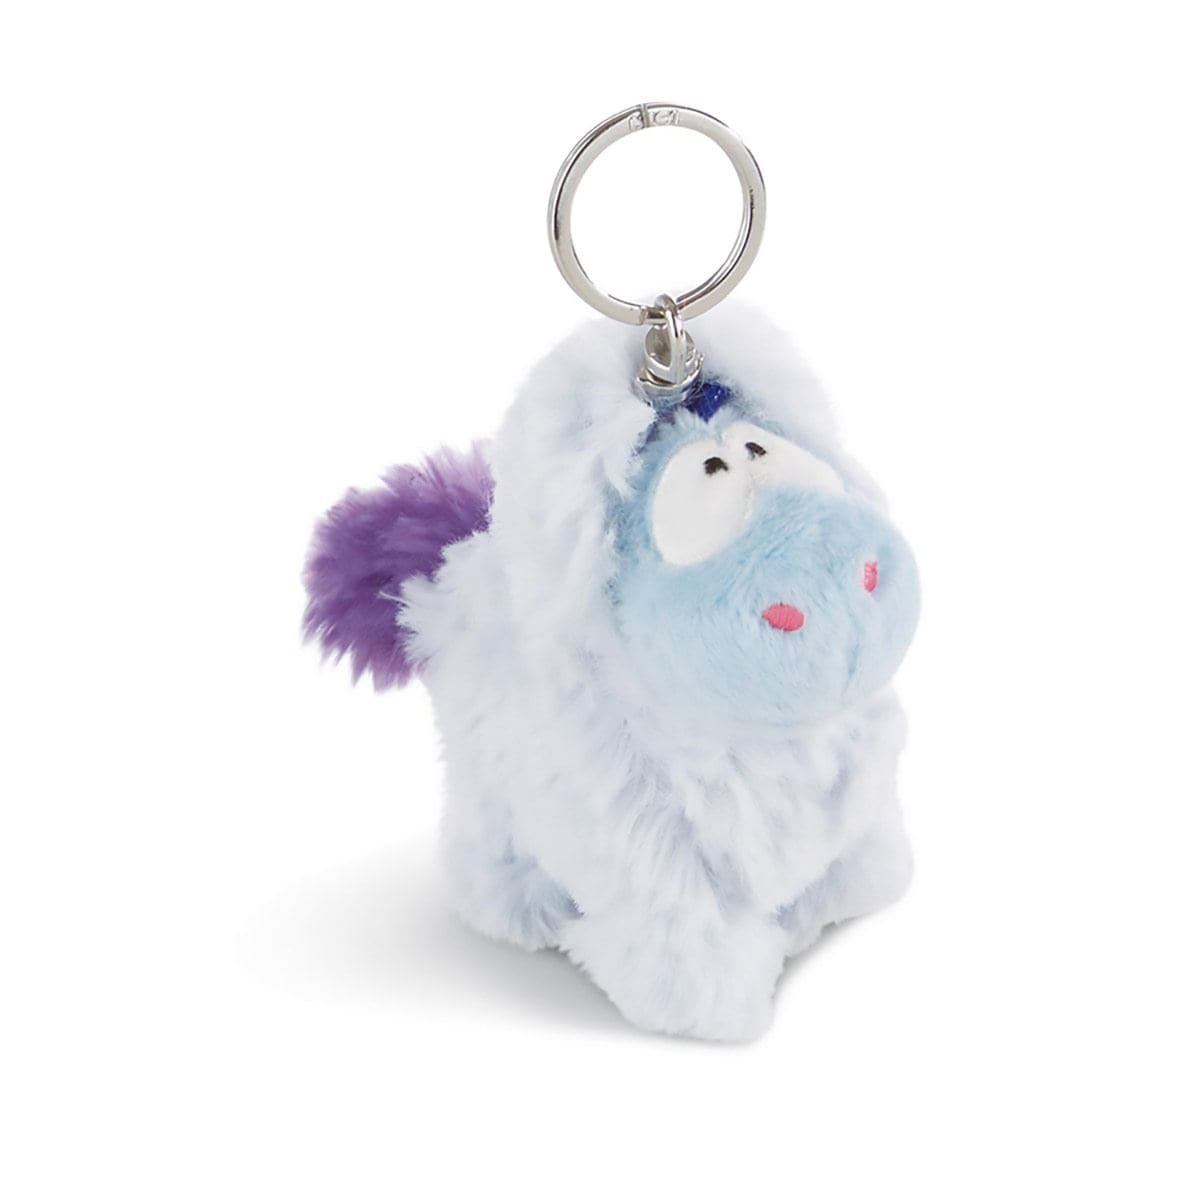 Unicornio Snow Coldson 10cm Nici